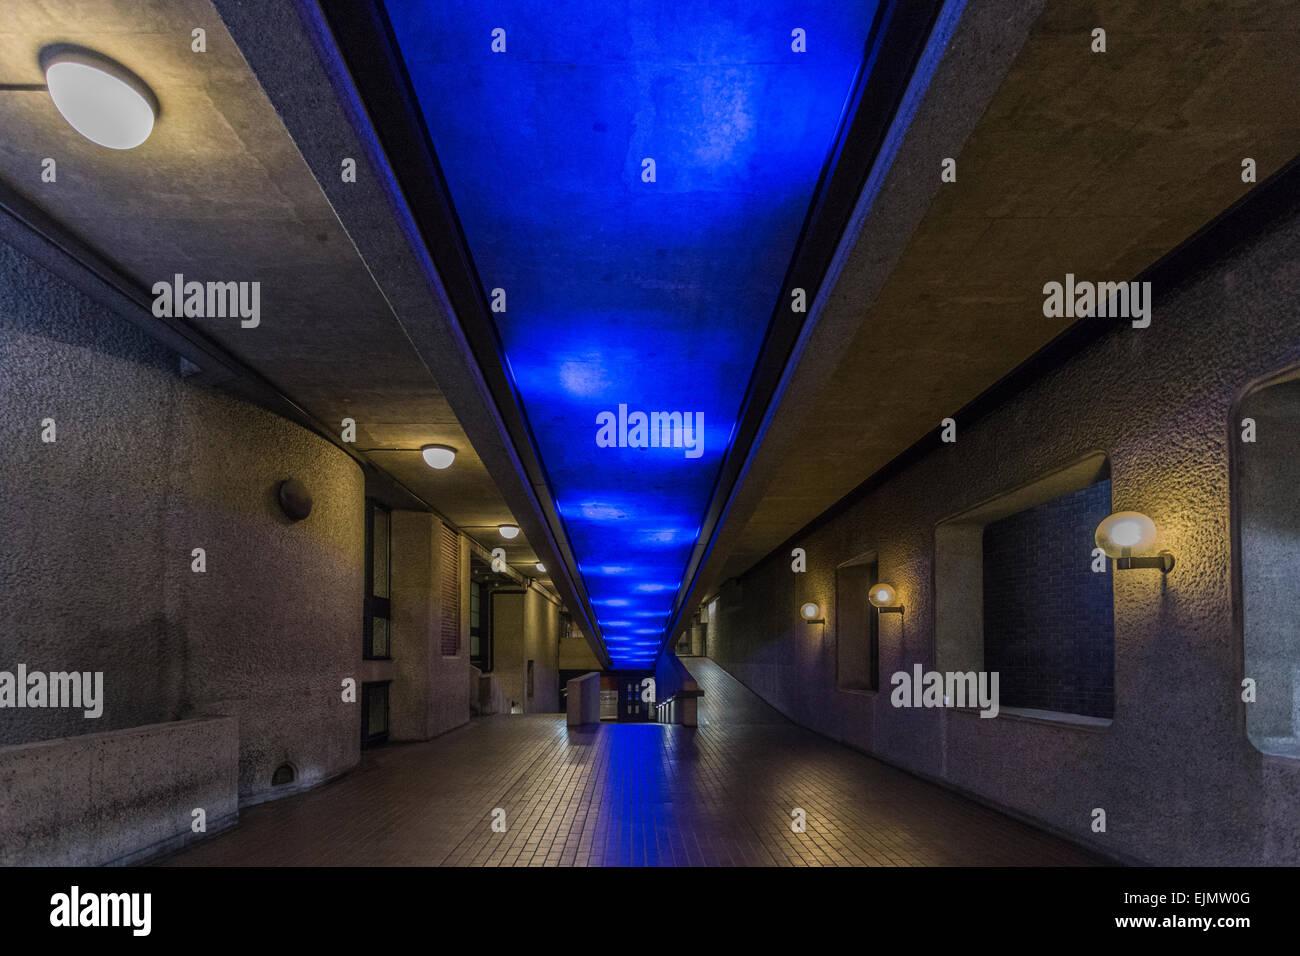 Barbican Centre Pedestrian Ramp, City of London, England, United Kingdom Stock Photo